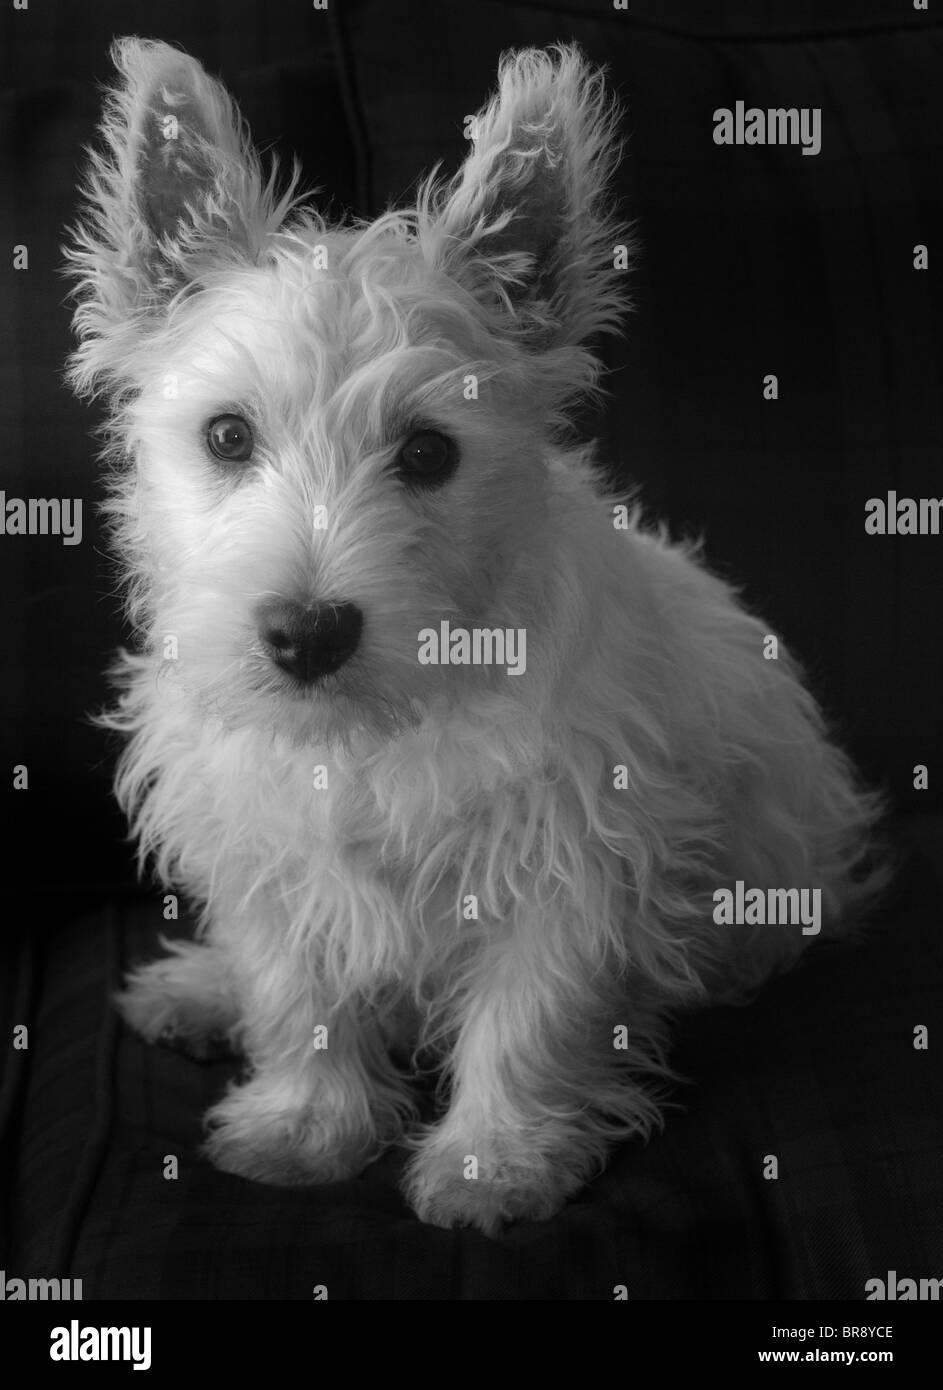 Small White West Highland Terrier Westie Puppy Dog Baxter Stock Photo Alamy